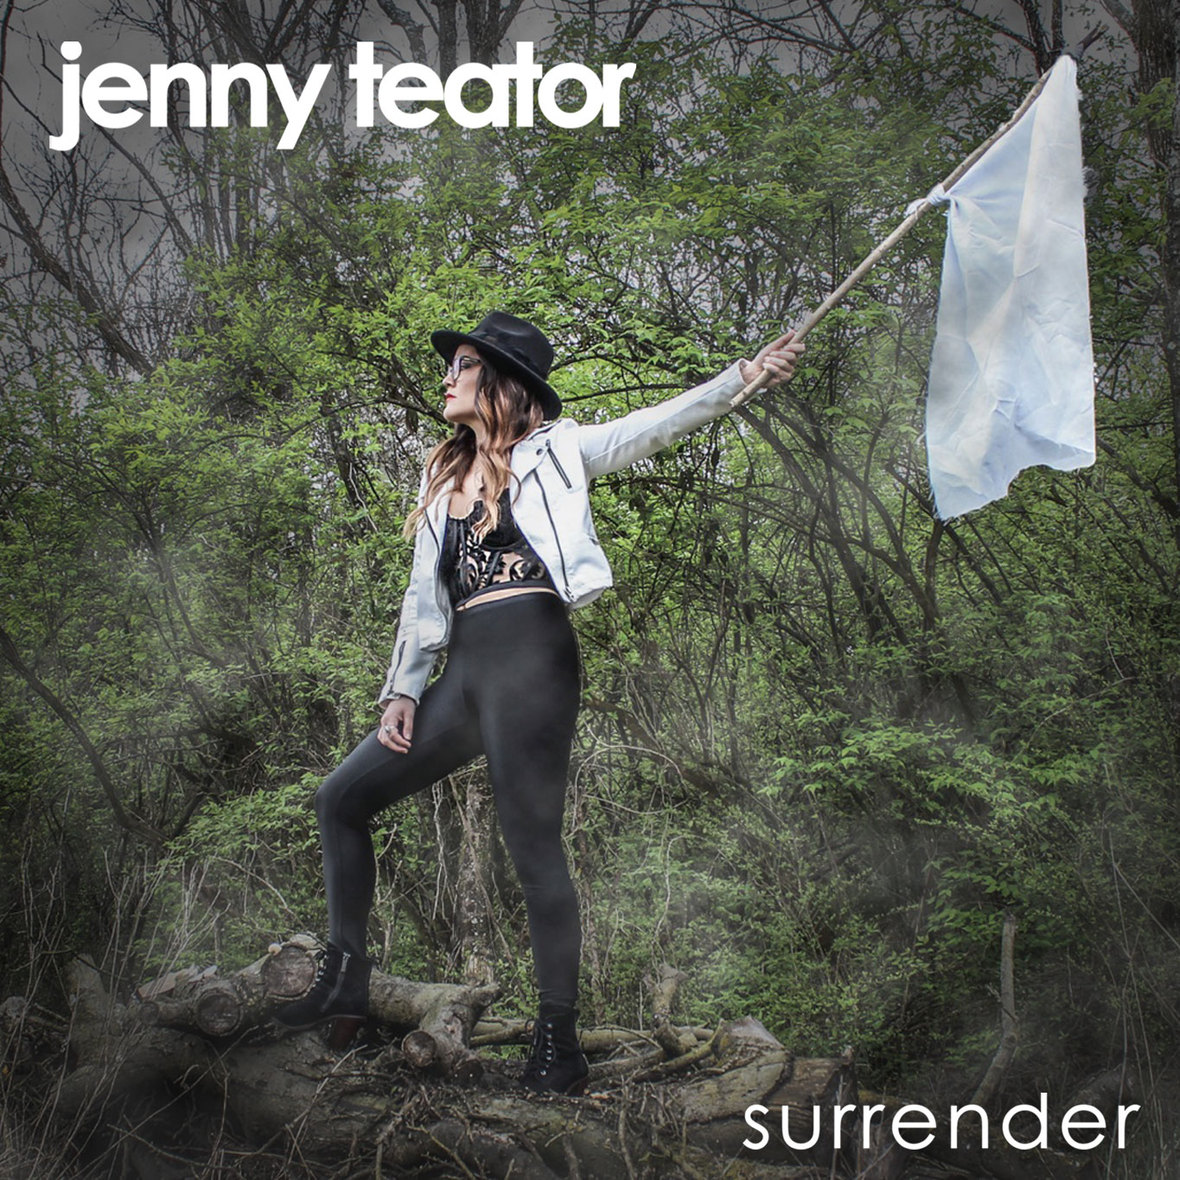 jennyTeator surrenderArtwork 9